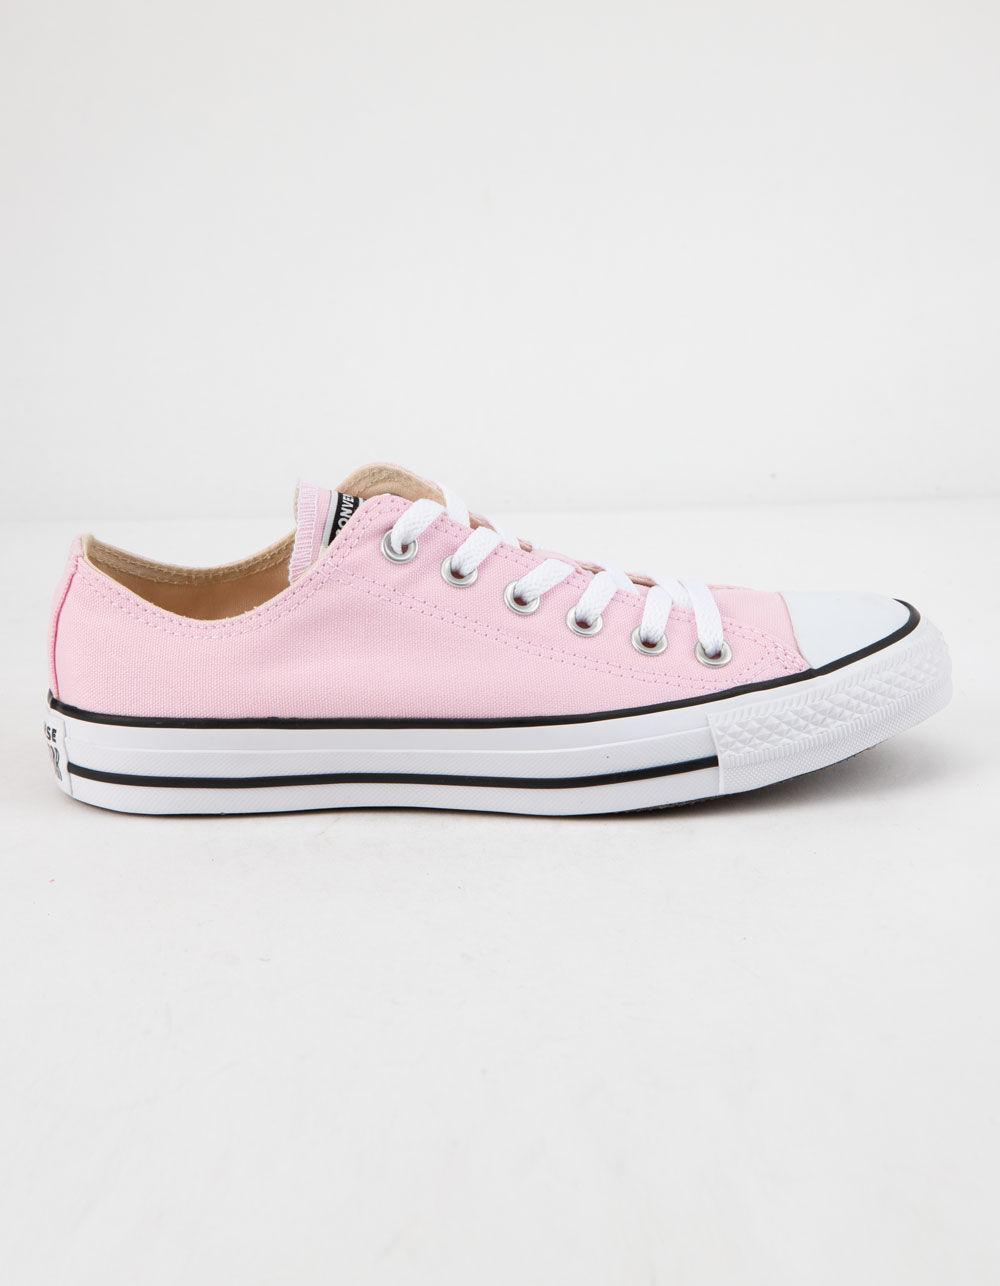 c3ced4d281c Converse. Chuck Taylor All Star Seasonal Color Pink Foam Womens ...